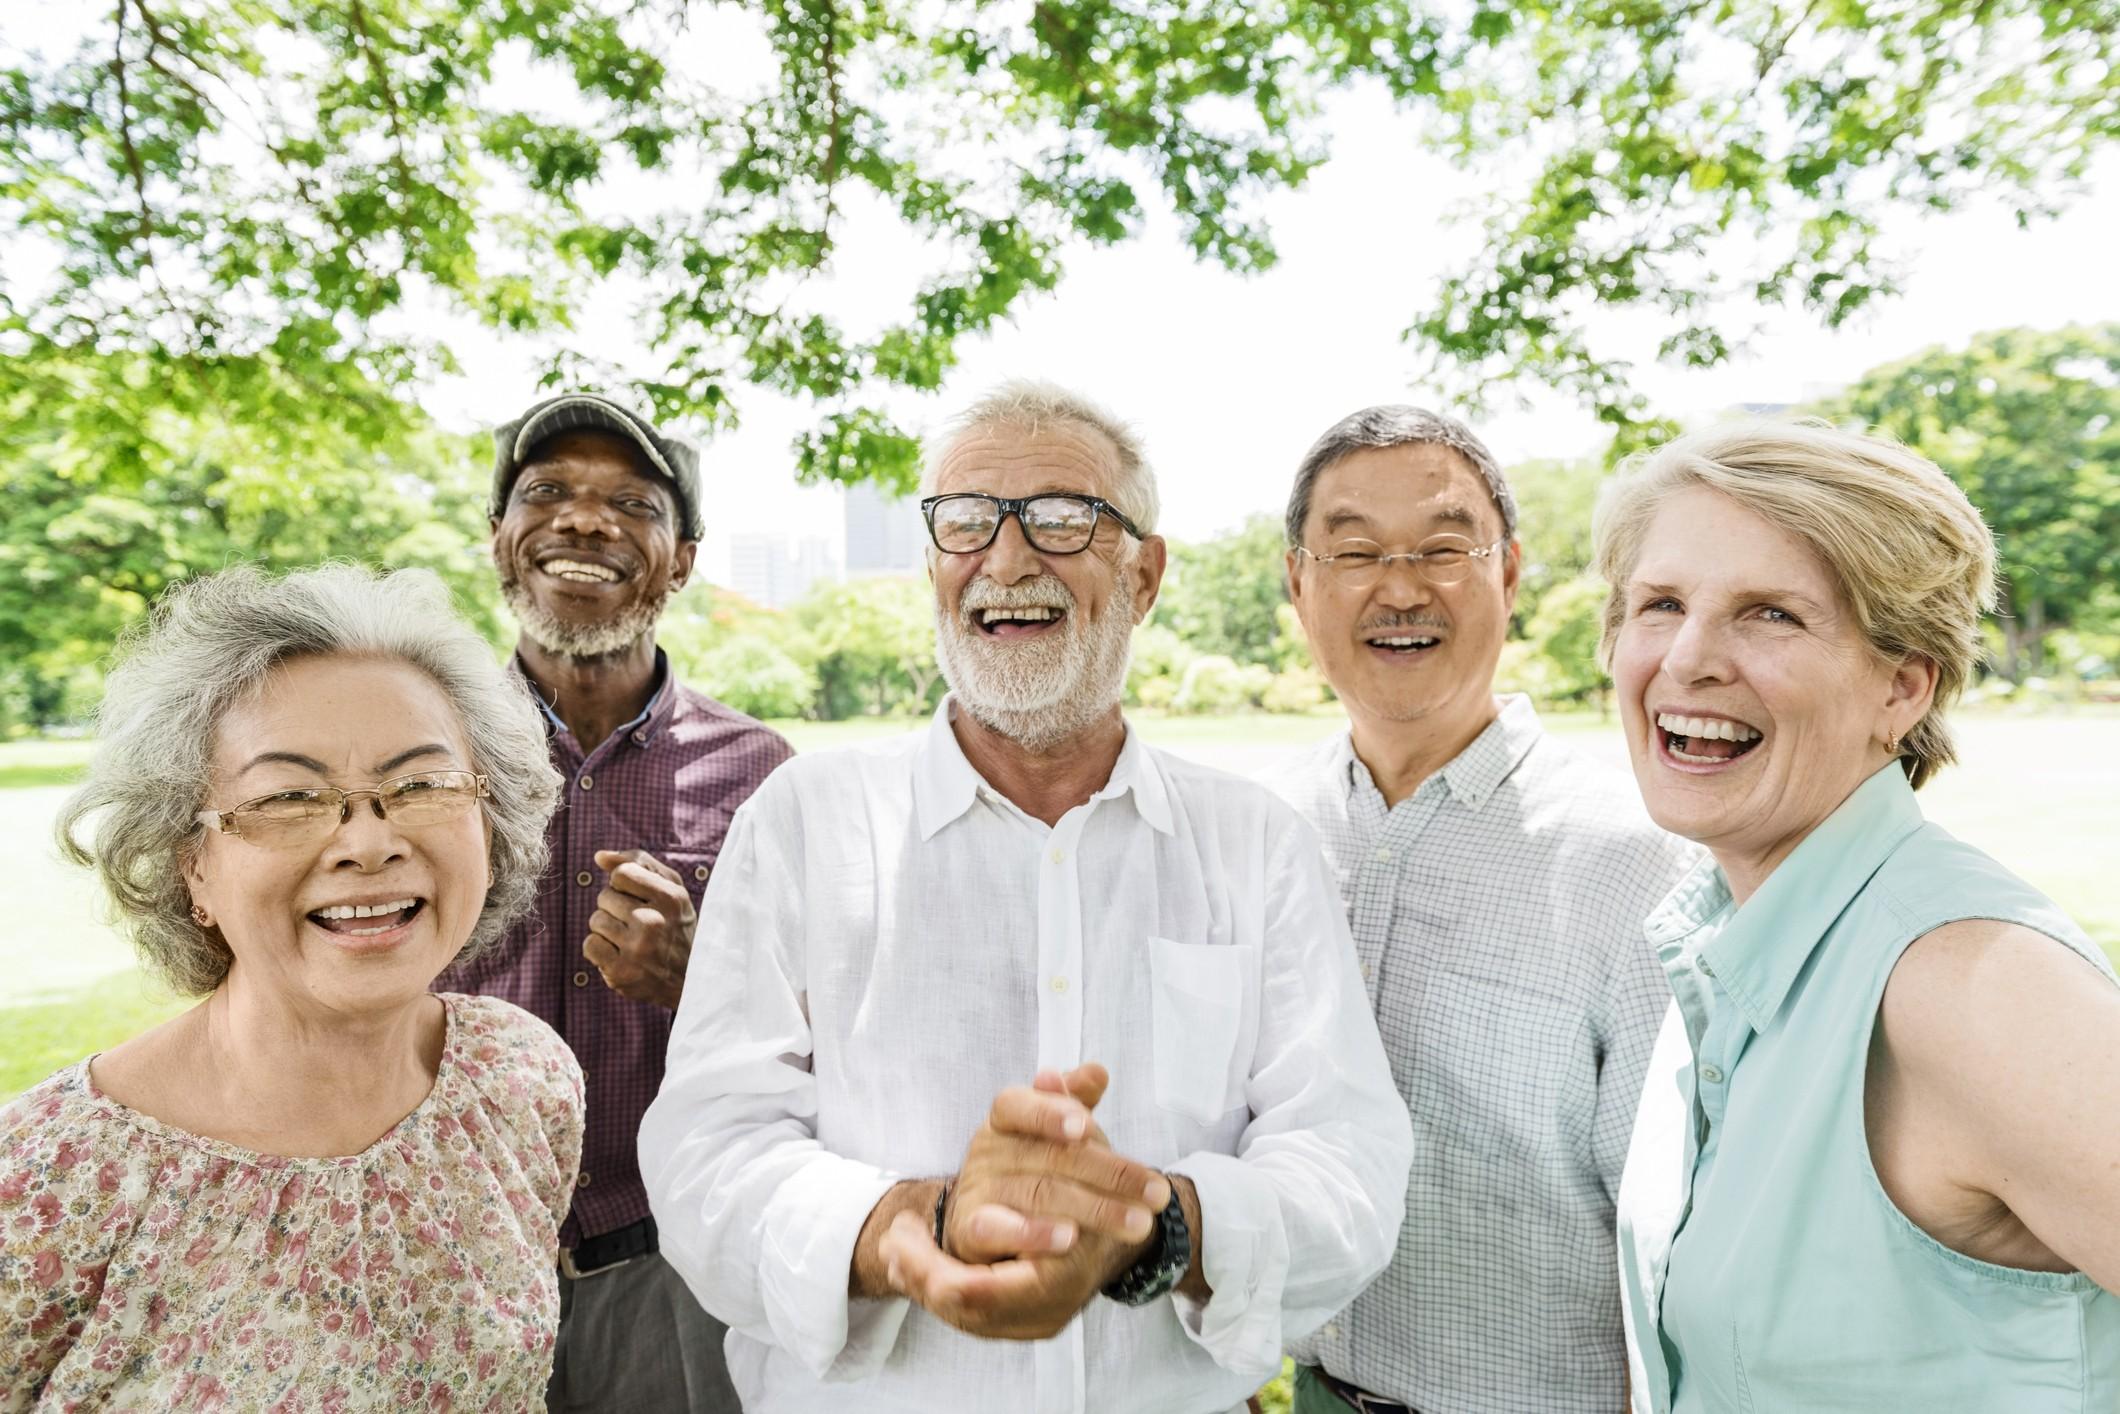 Group of seniors